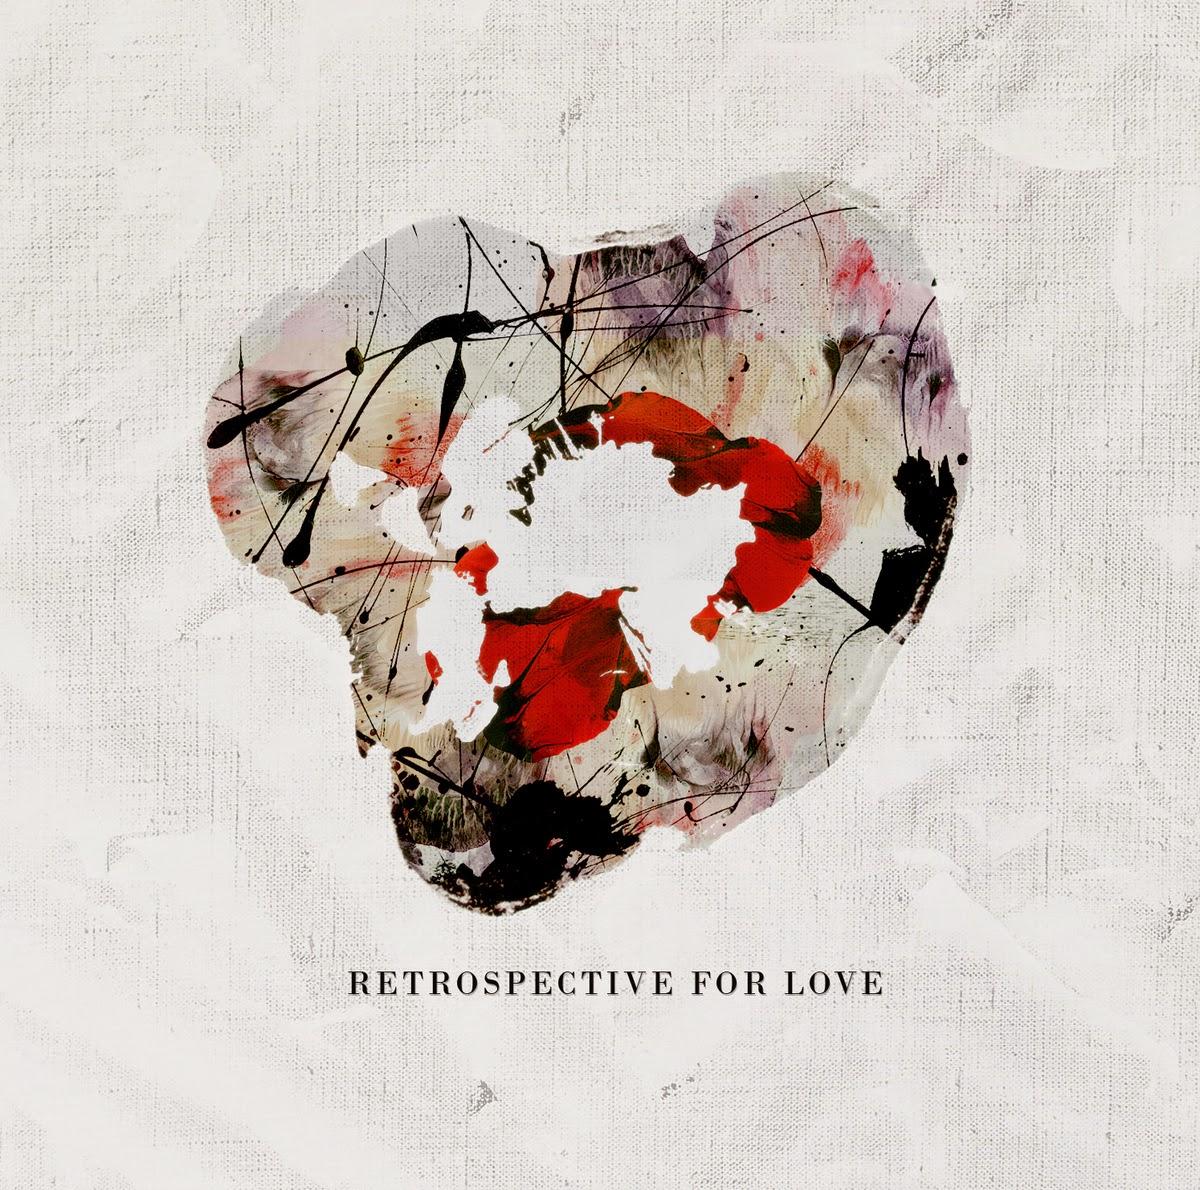 http://retrospectiveforlove.bandcamp.com/album/retrospective-for-love-ep